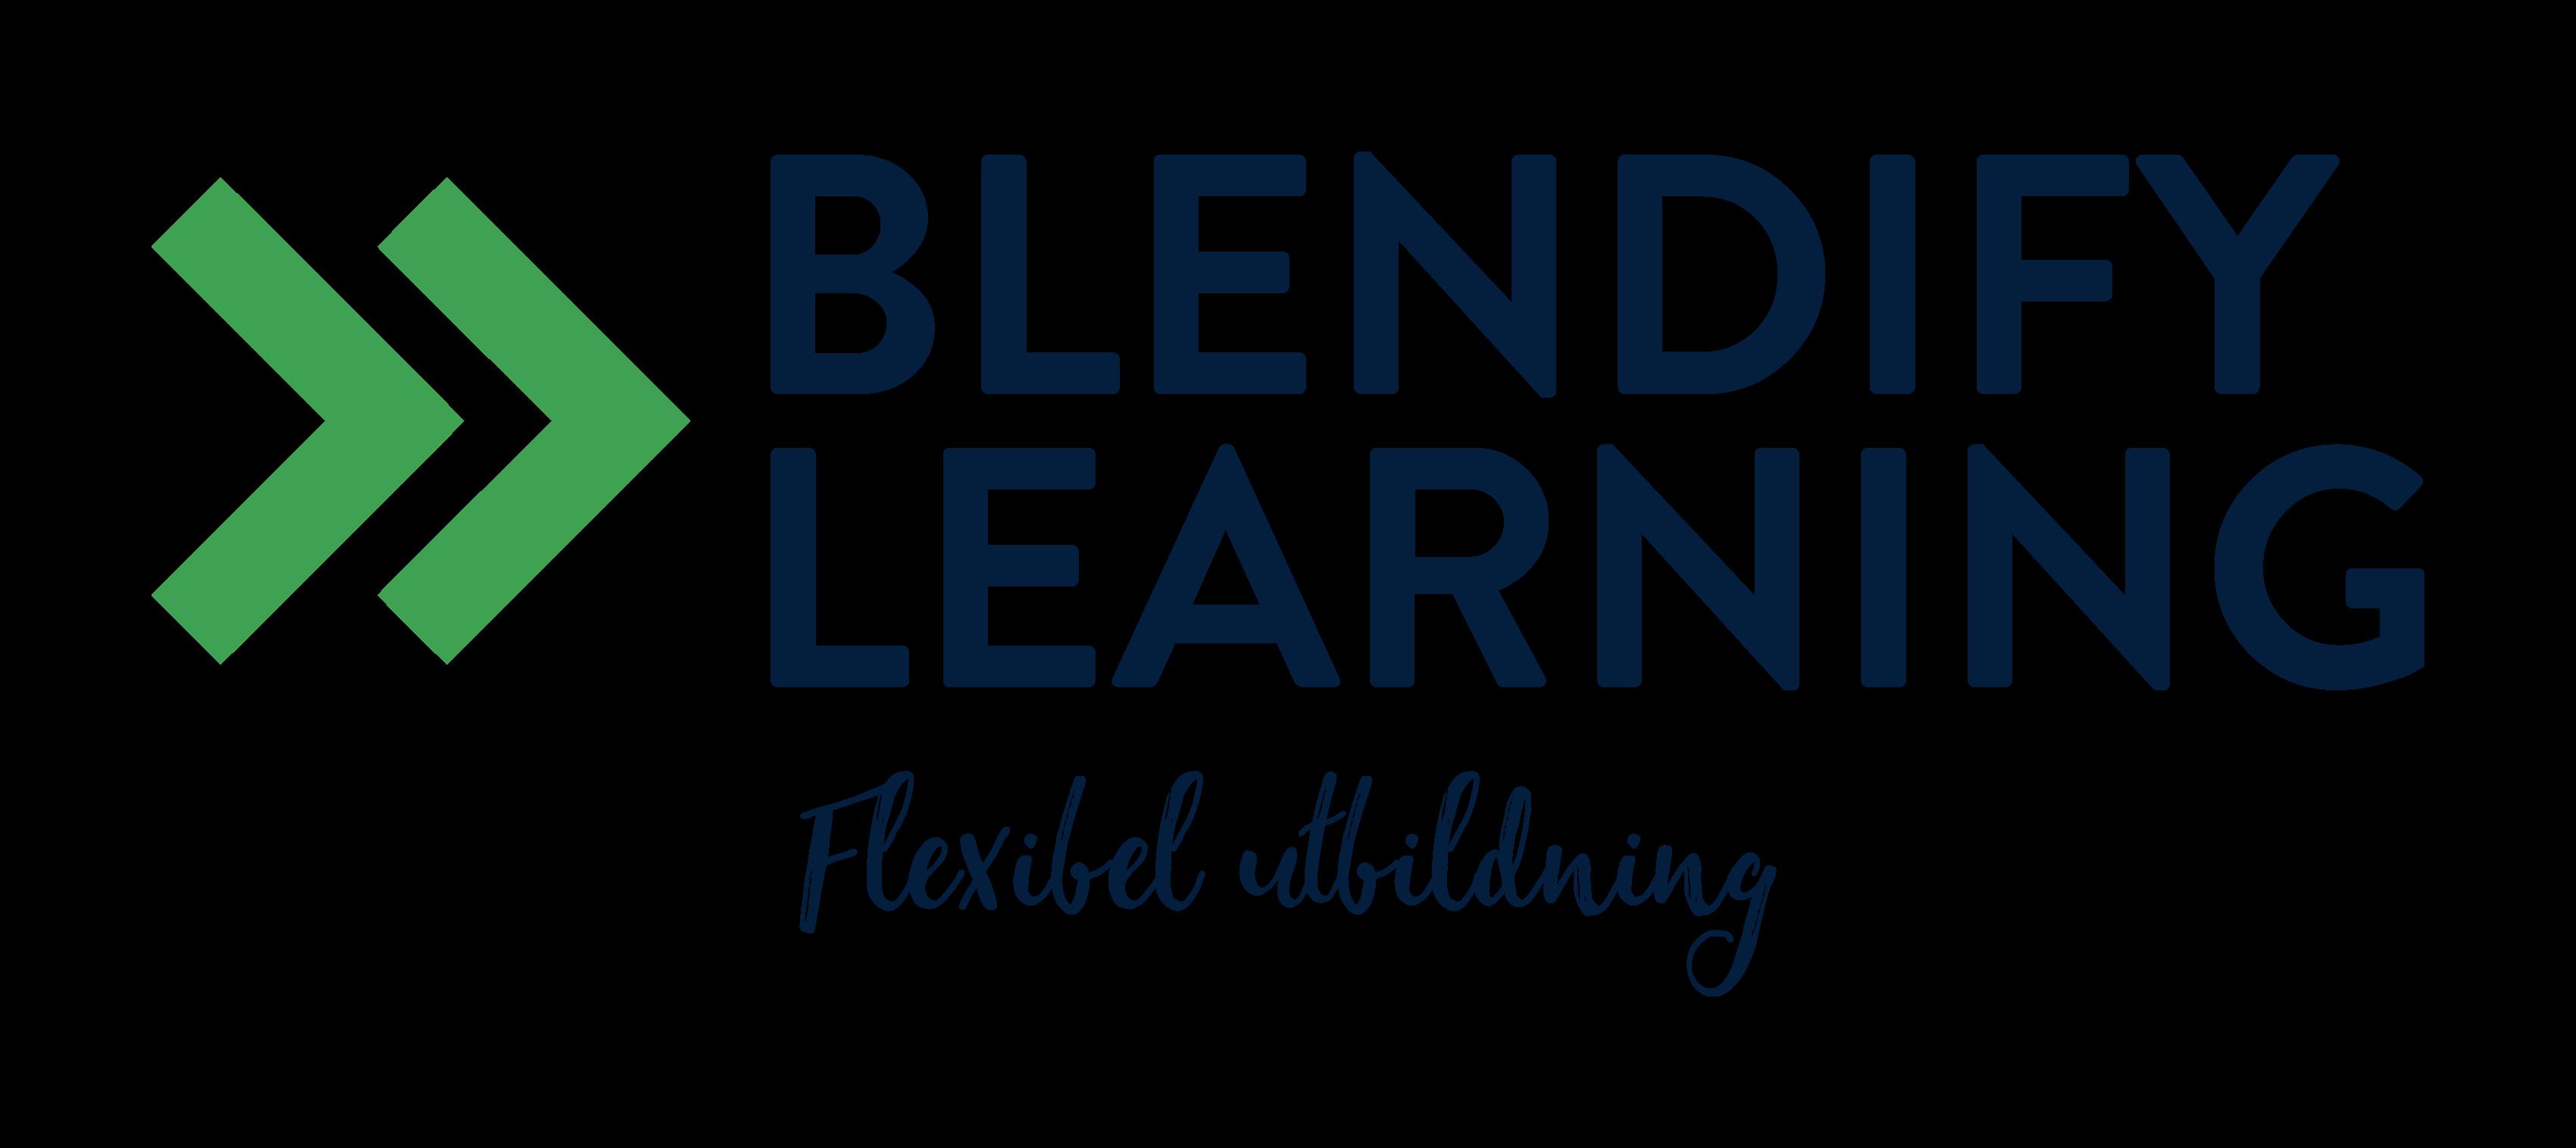 www.blendifylearning.com